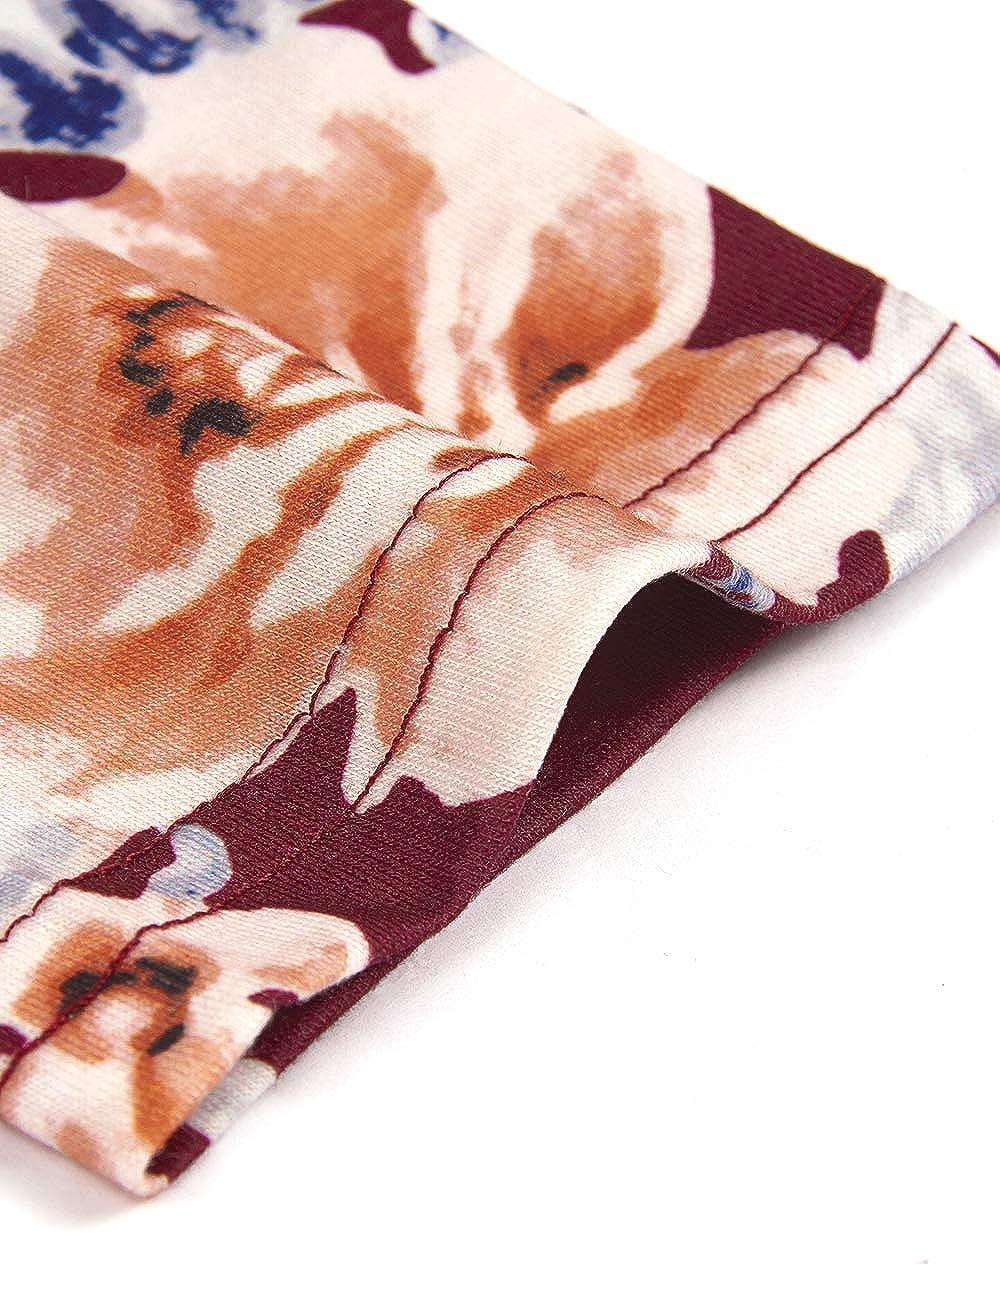 Becanbe Womens Crewneck Long Sleeve Floral Shirts Flared Casual Maternity Nursing Tops Breastfeeding Shirts